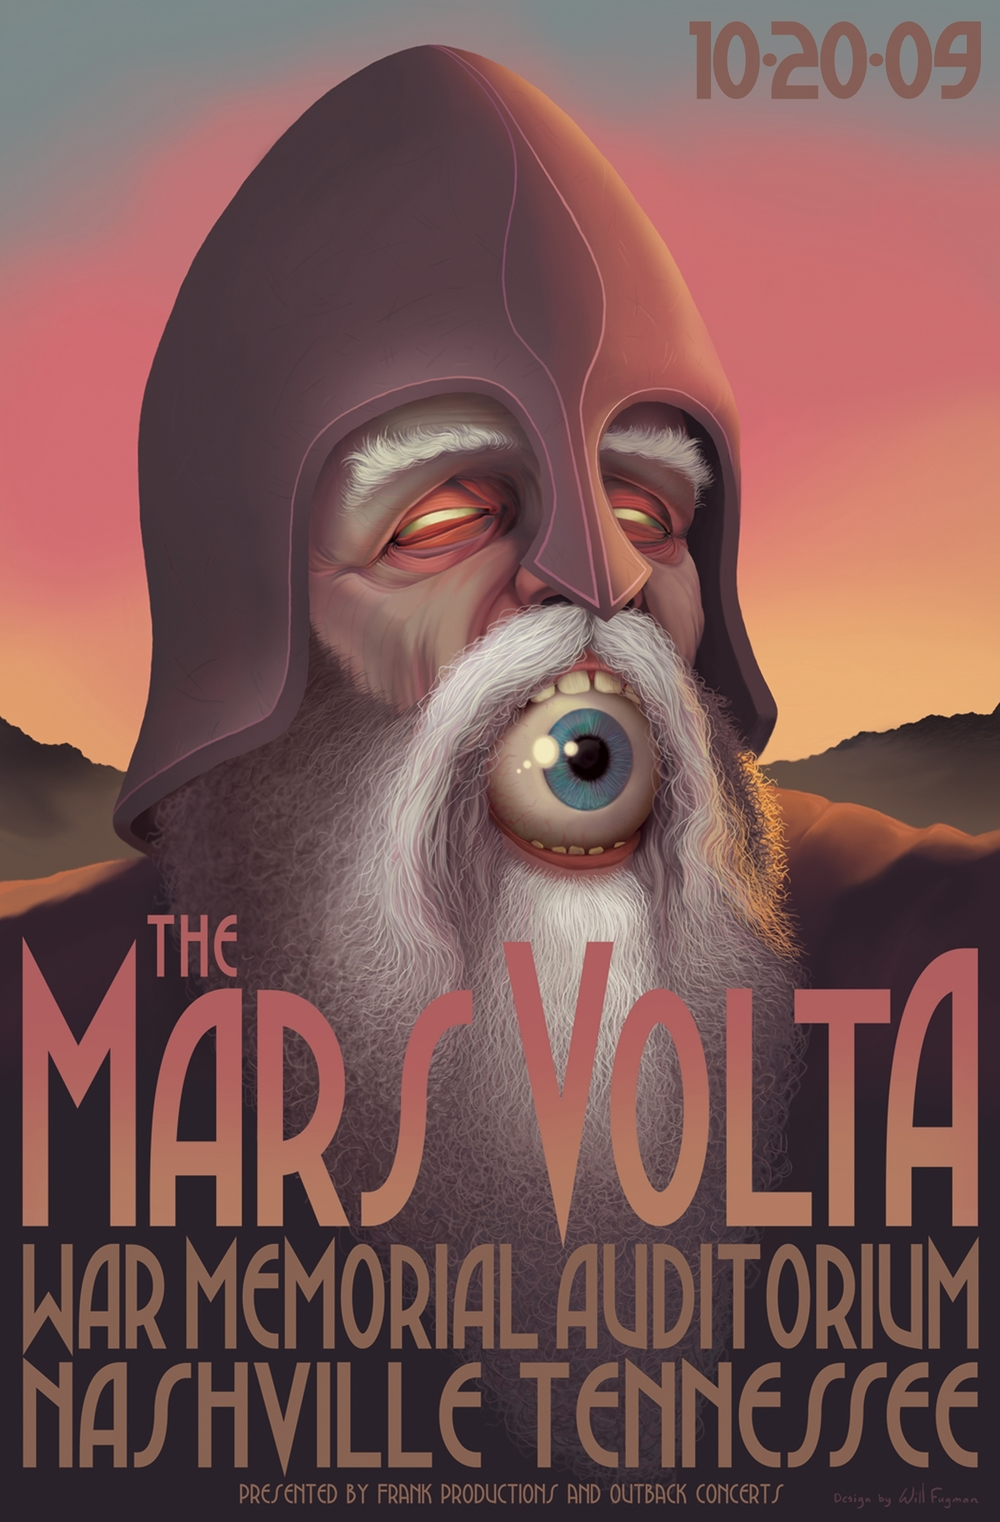 Mars Volta 2009